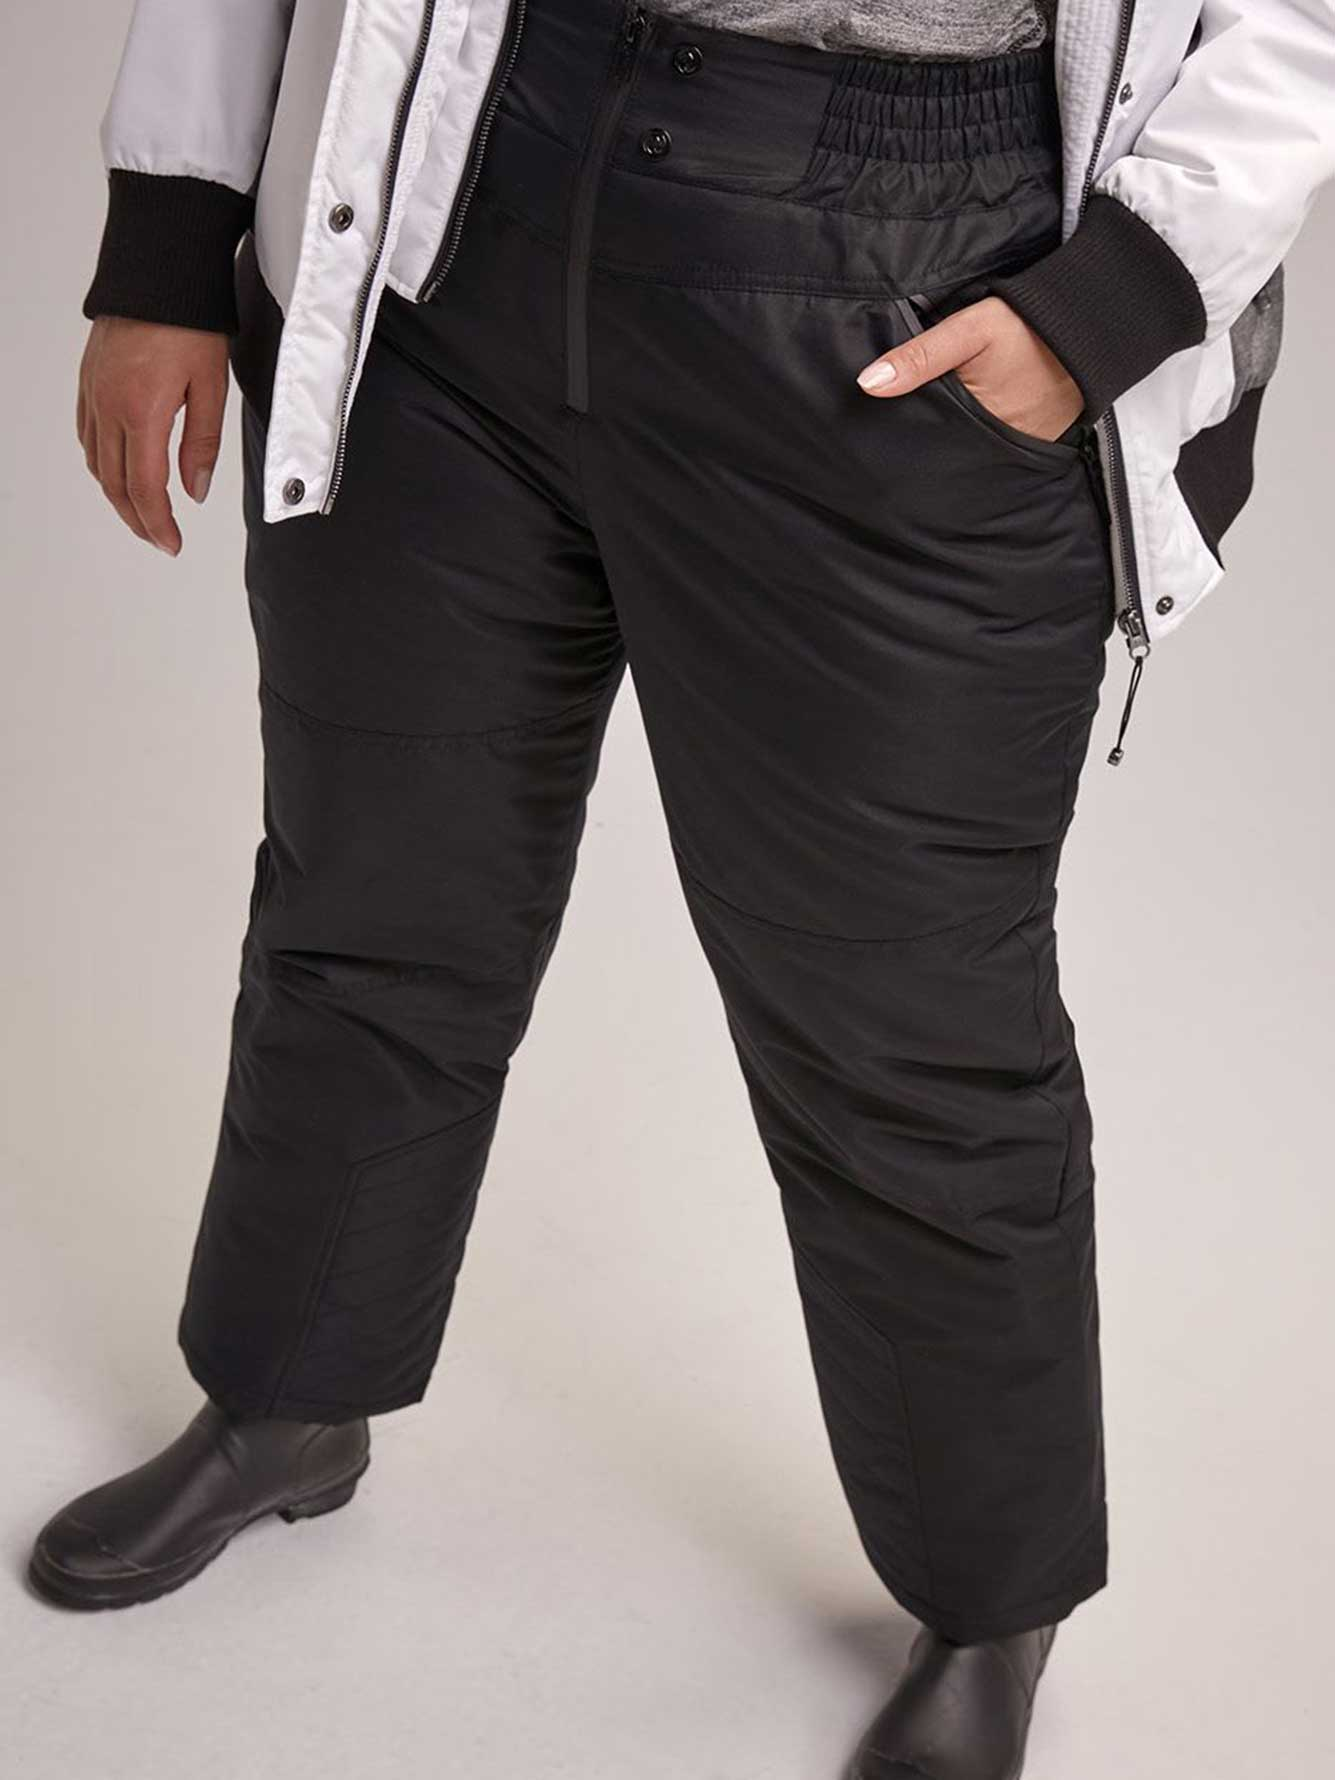 6fbce46f6c4 Black Plus Size Ski Pant - ActiveZone | Penningtons